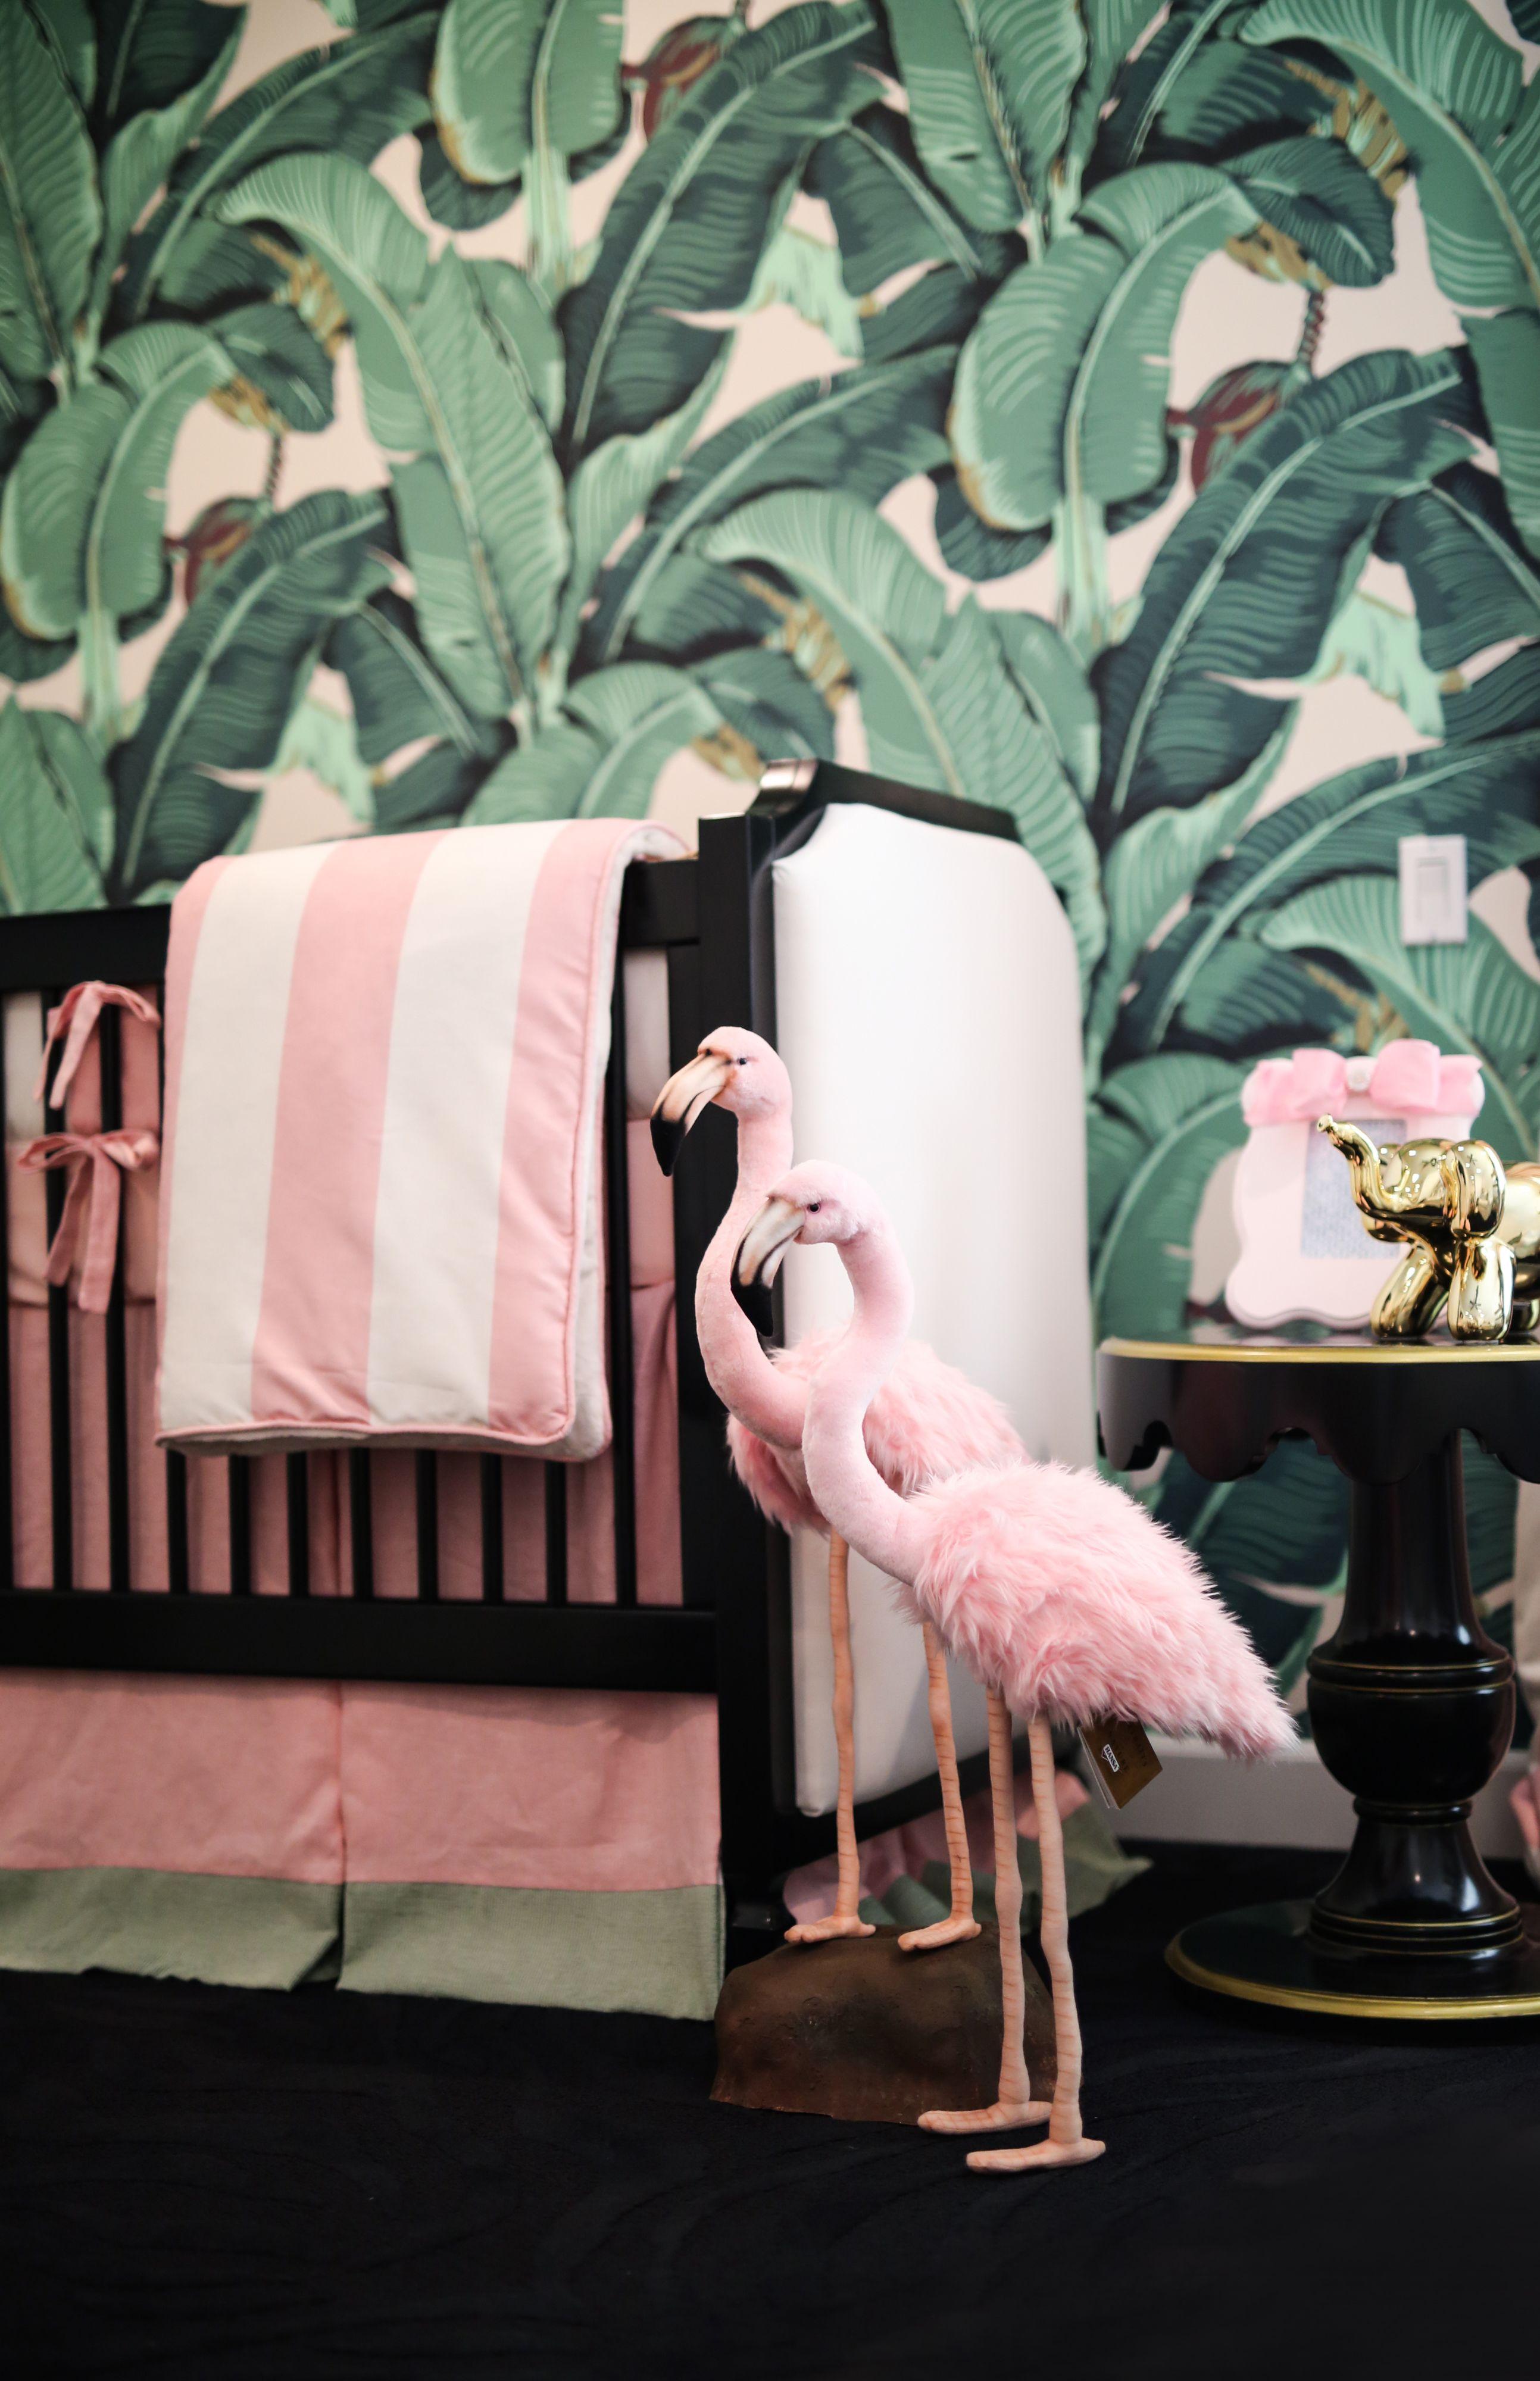 Baby flamingo car interior design - Beverly Hills Hotel Inspired Nursery